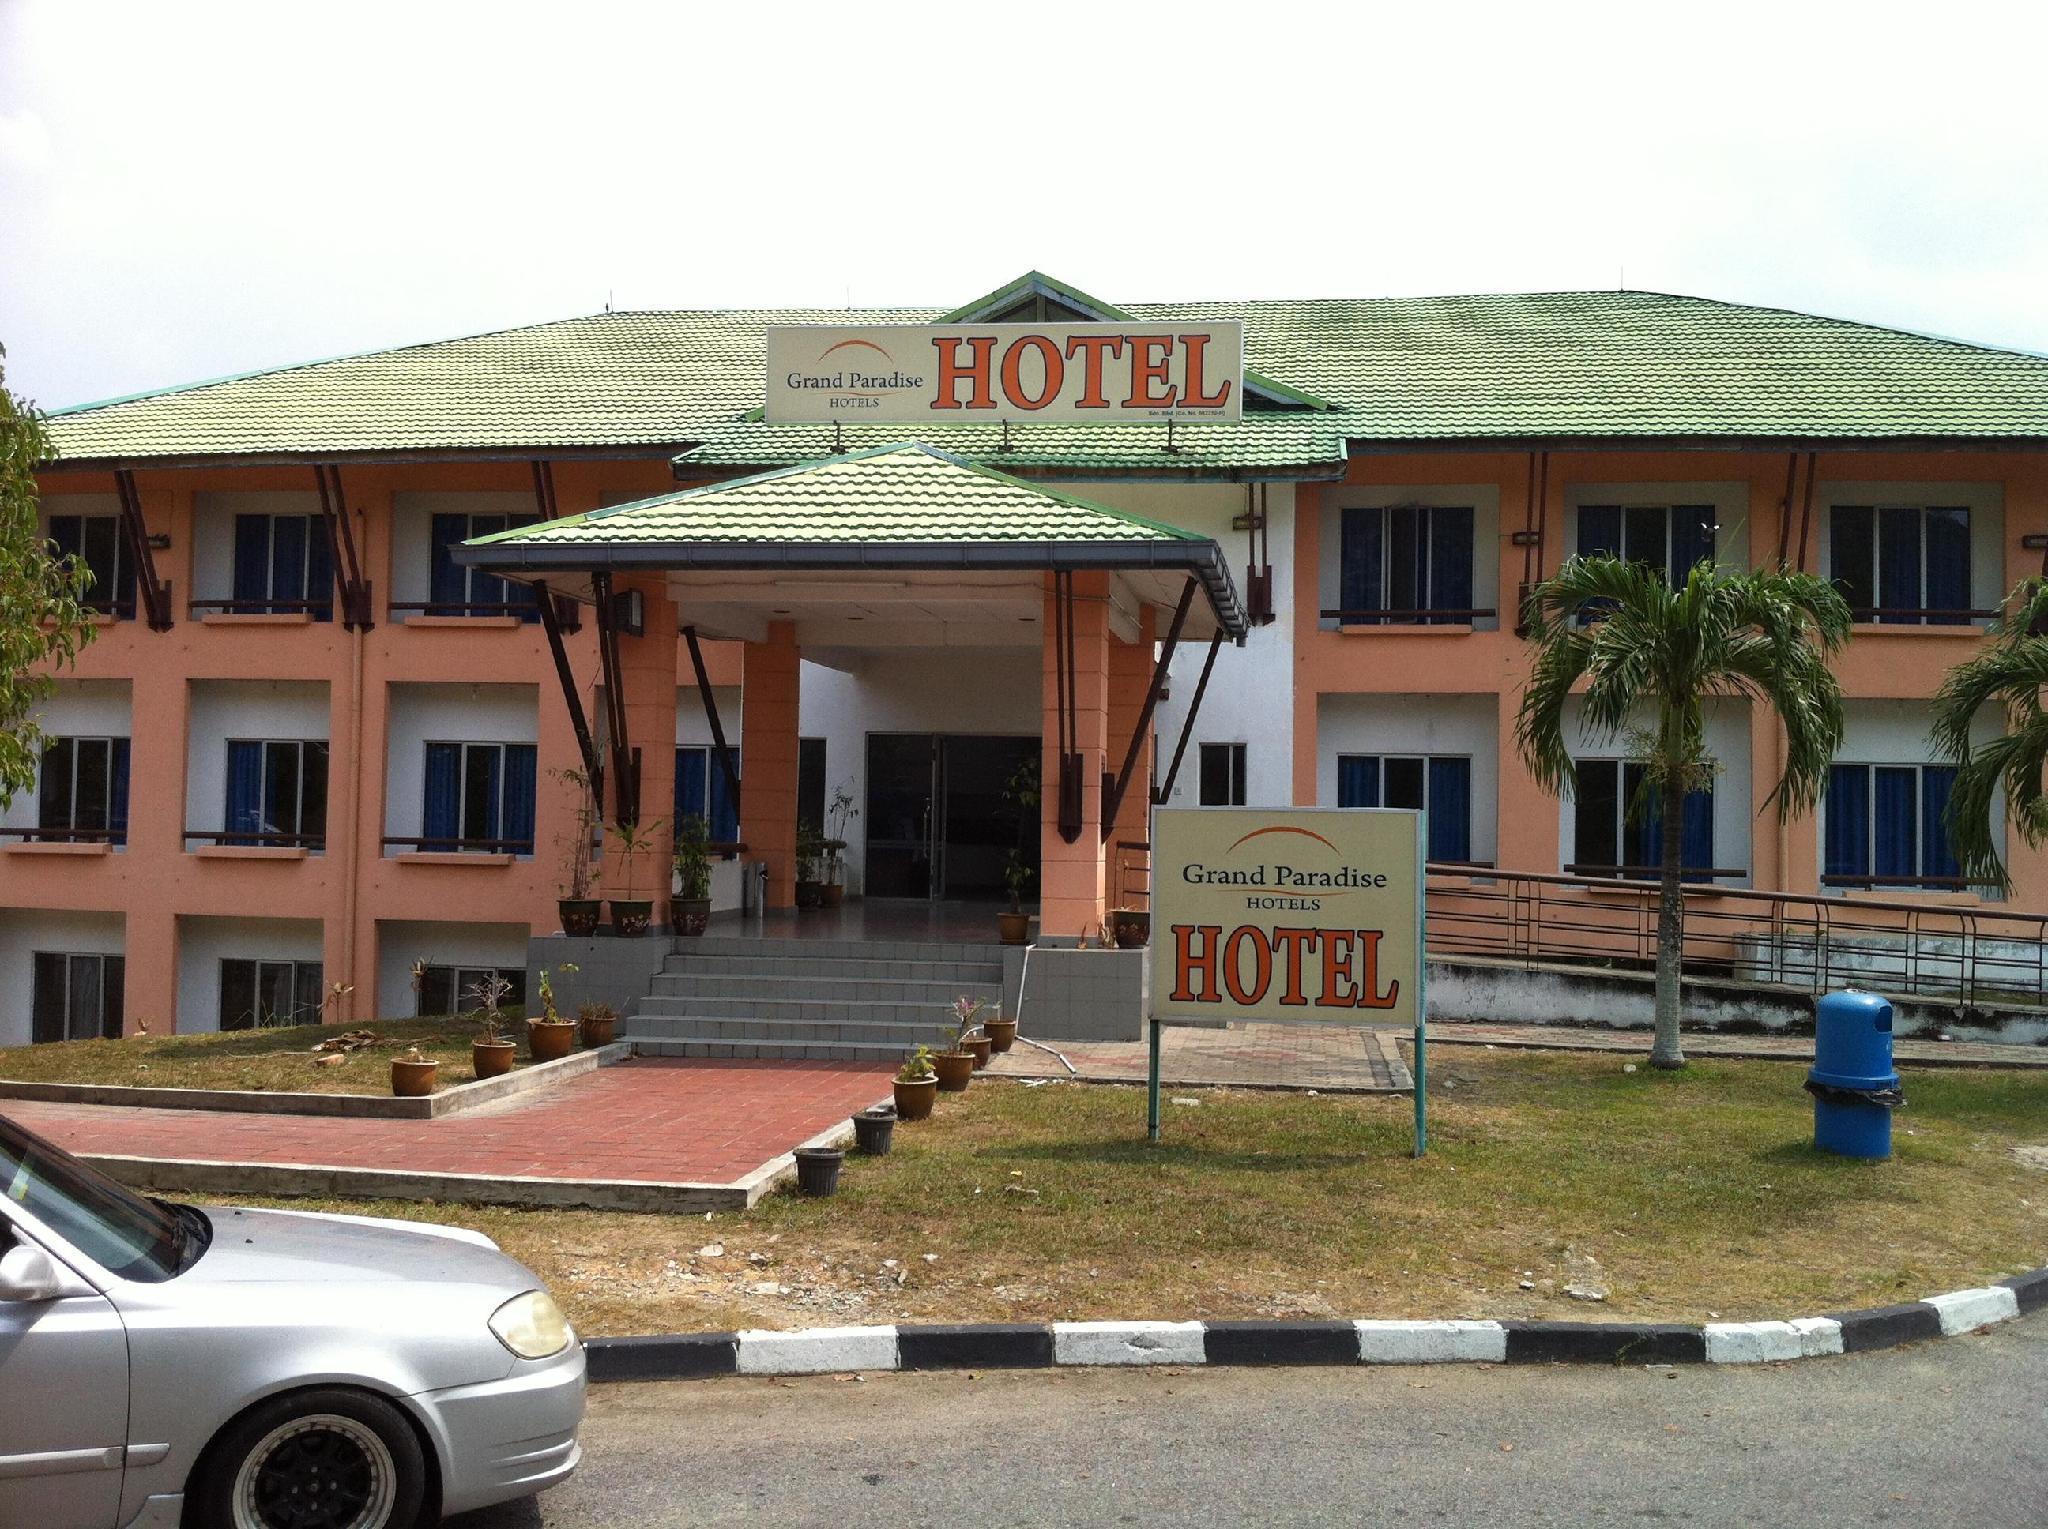 Grand Paradise Highway Hotel Ayer Keroh - Alor Gajah, Malacca, Malaysia - Great discounted rates!